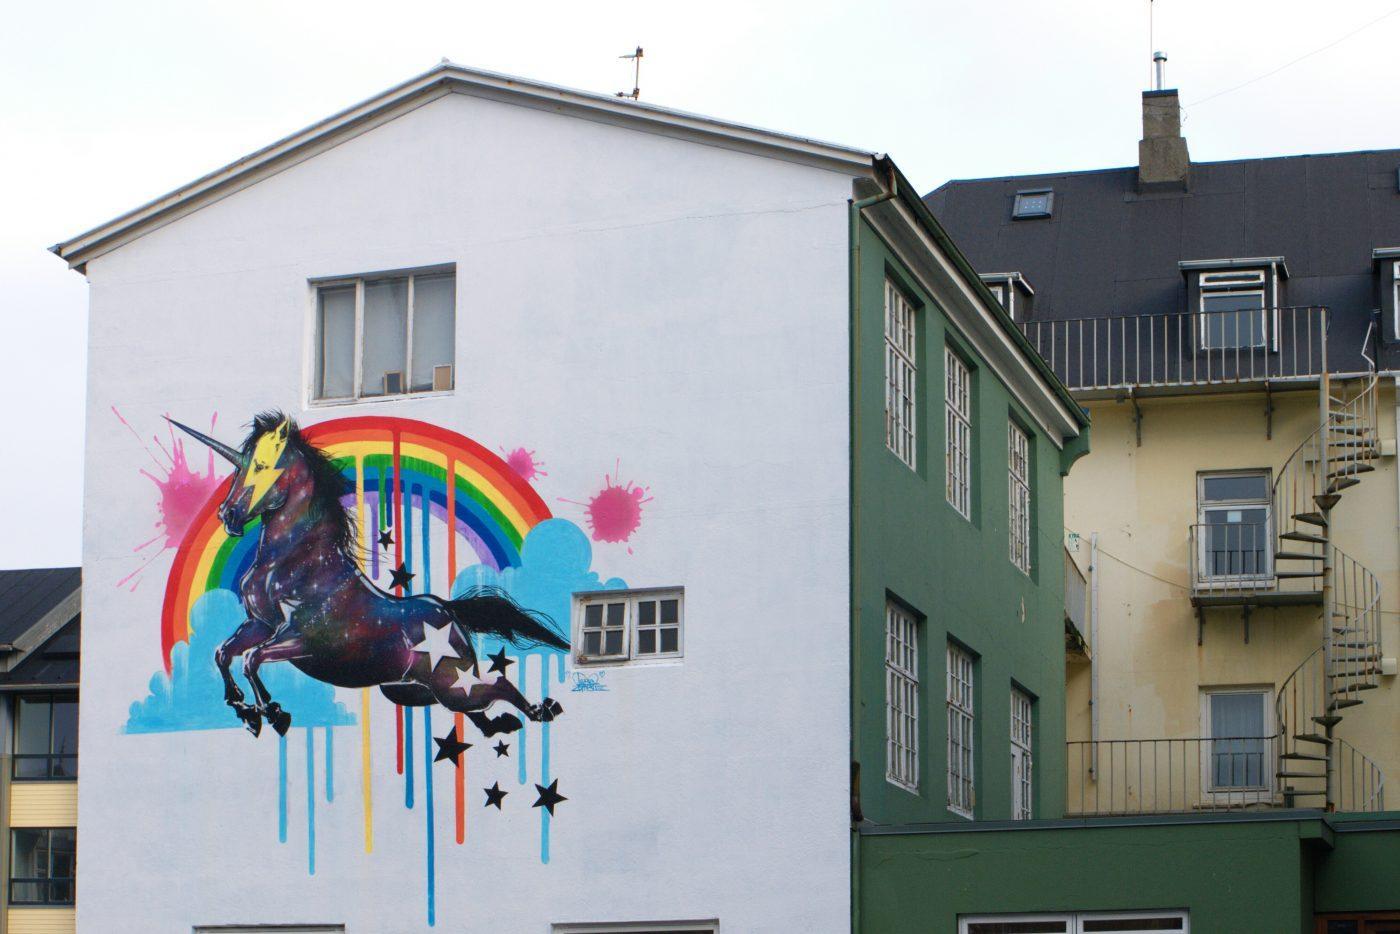 Rainbow and Unicorn